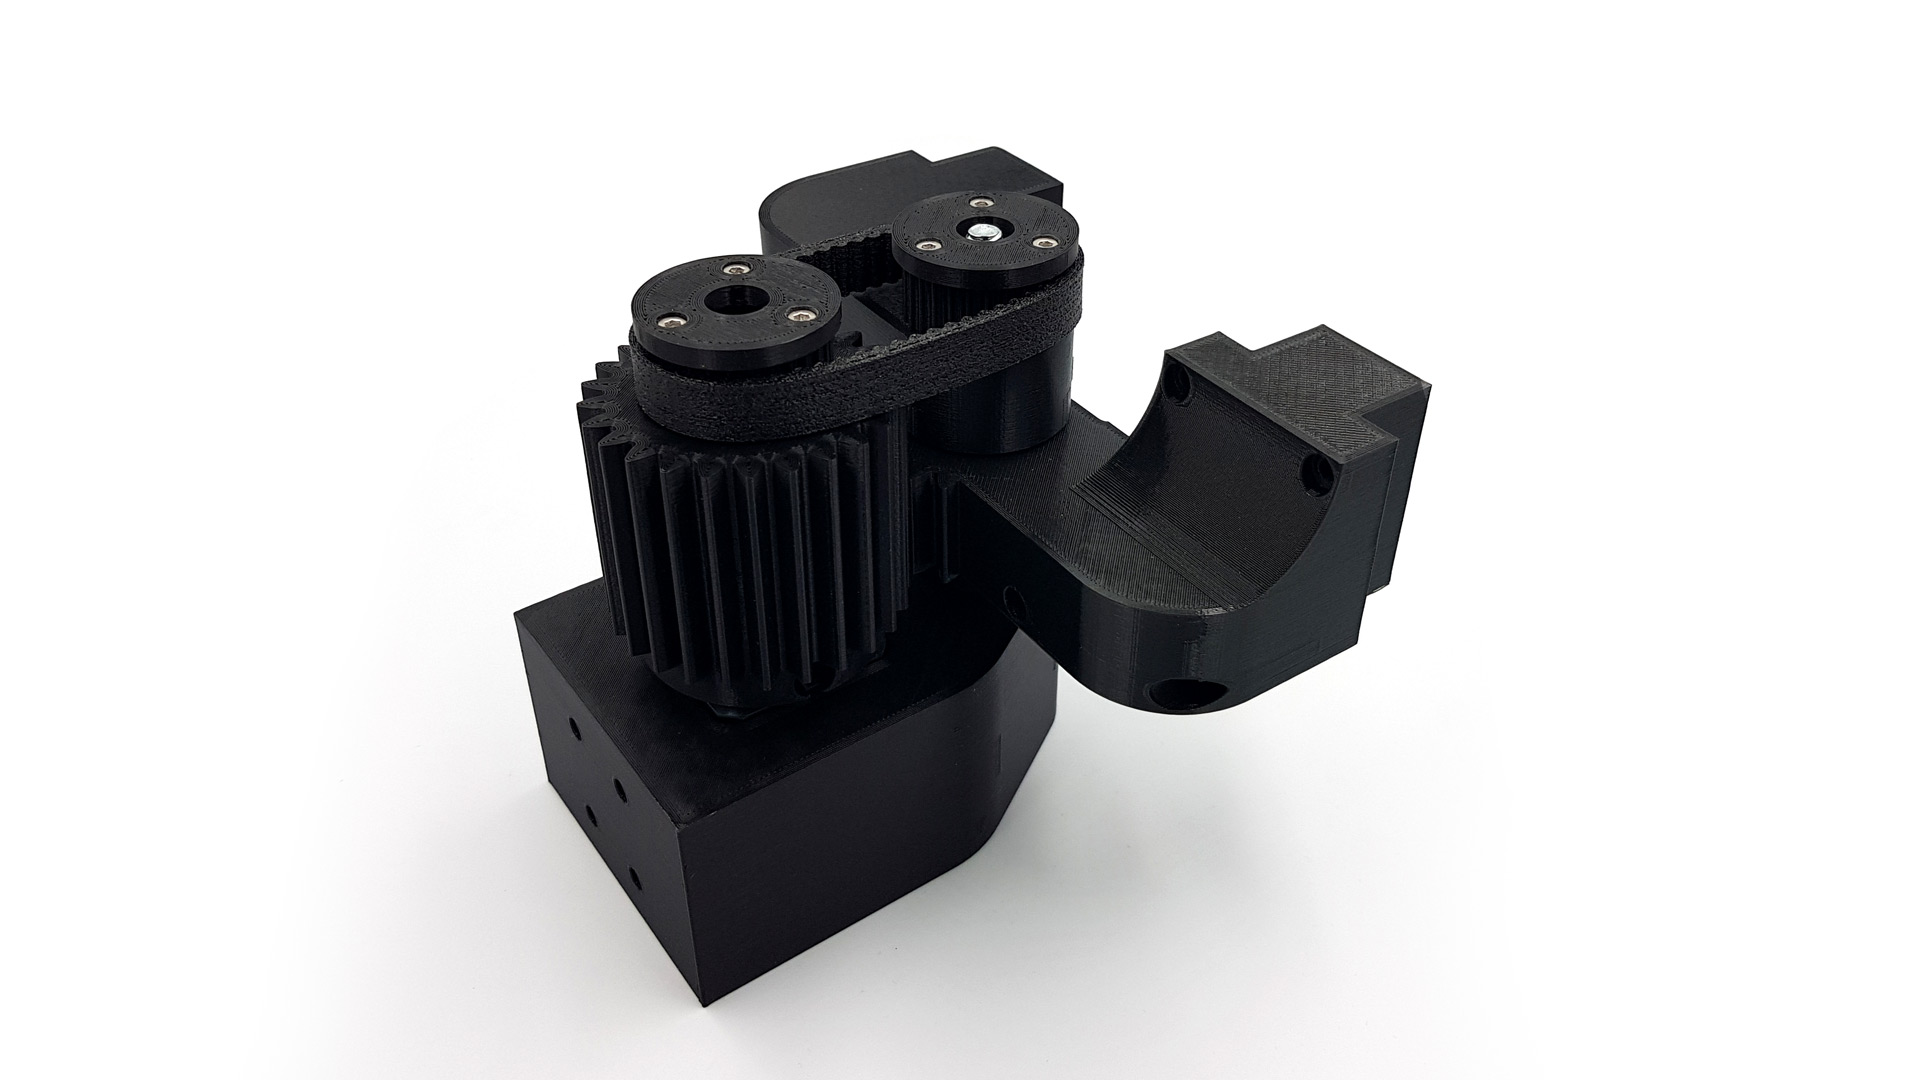 Transmisión - Prototipado Rápido PLA + Correa Impresión Flex